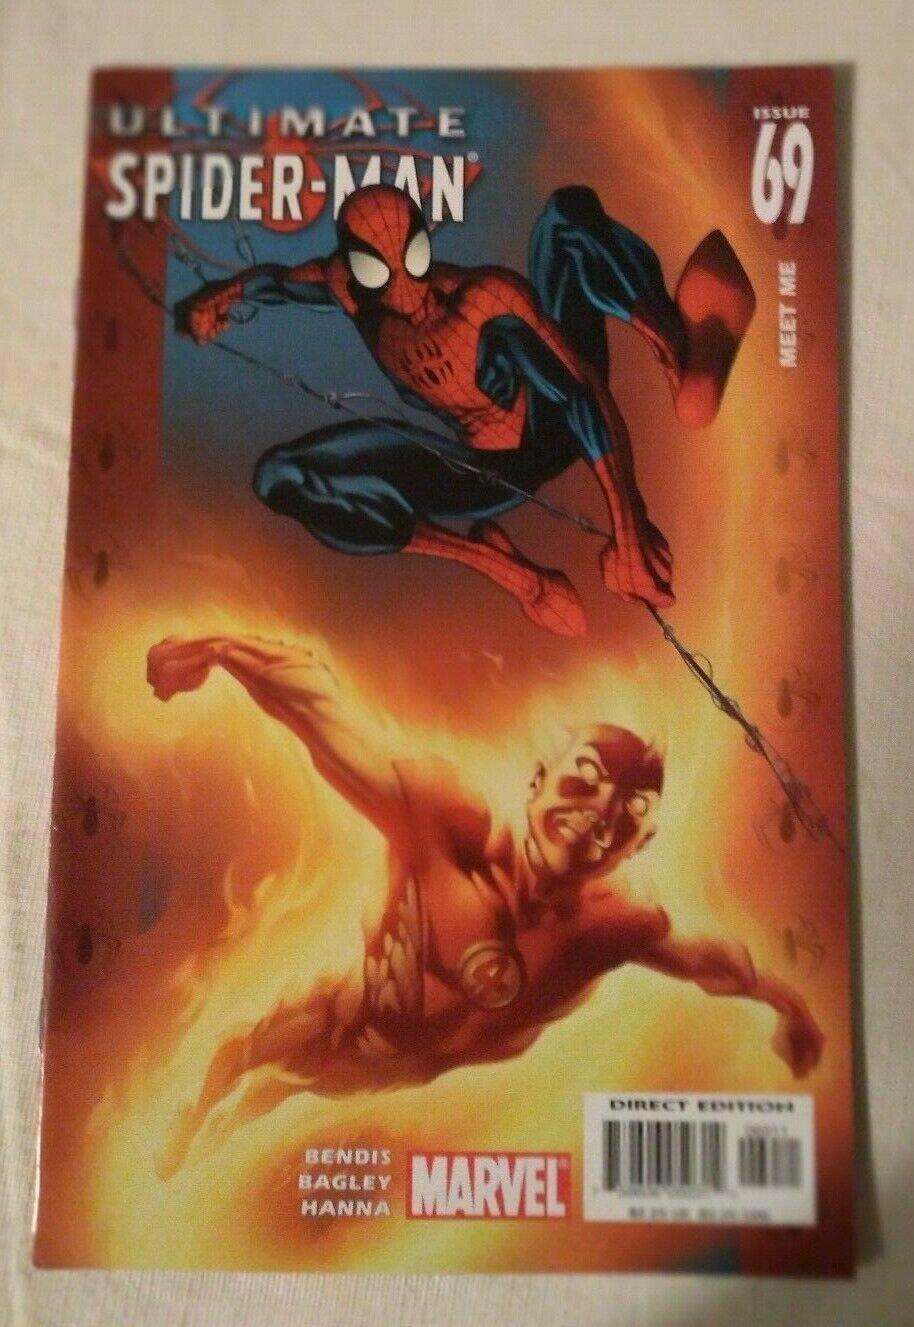 Ultimate Spider-man #69 VF/NM Brian Bendis Mark Bagley Marvel Comics